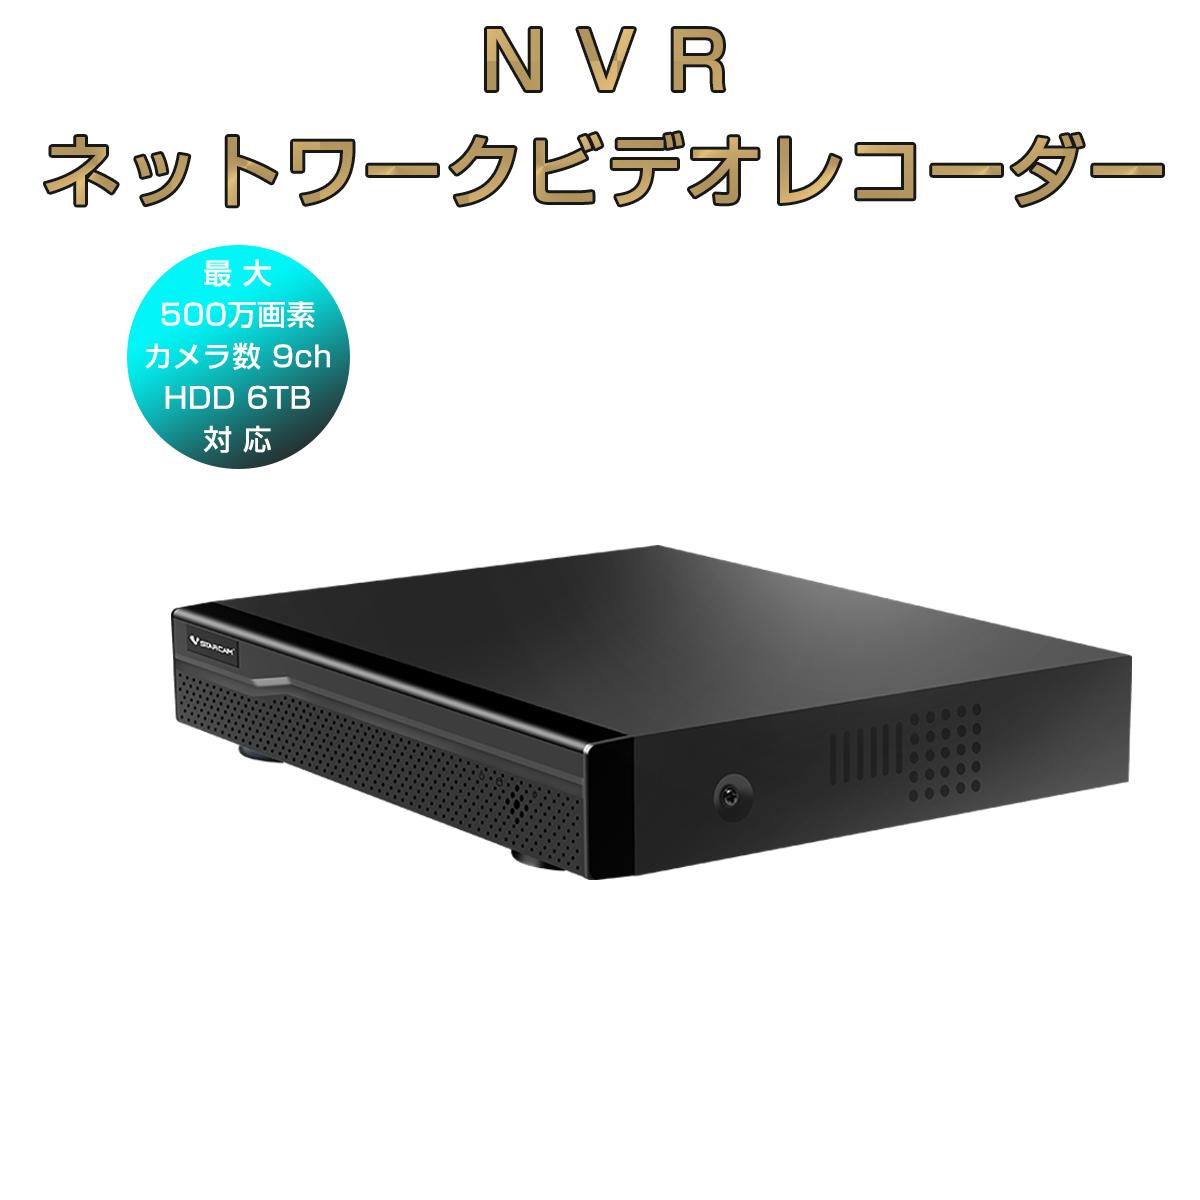 NVR ネットワークビデオレコーダー 9ch IP ONVIF形式 スマホ対応 遠隔監視 HDD最大6TB対応 1080P FHD 500万画素カメラ対応 動体検知 同時出力 録音対応 H.265+ IPカメラレコーダー監視システム 宅配便送料無料 1年保証 K&M